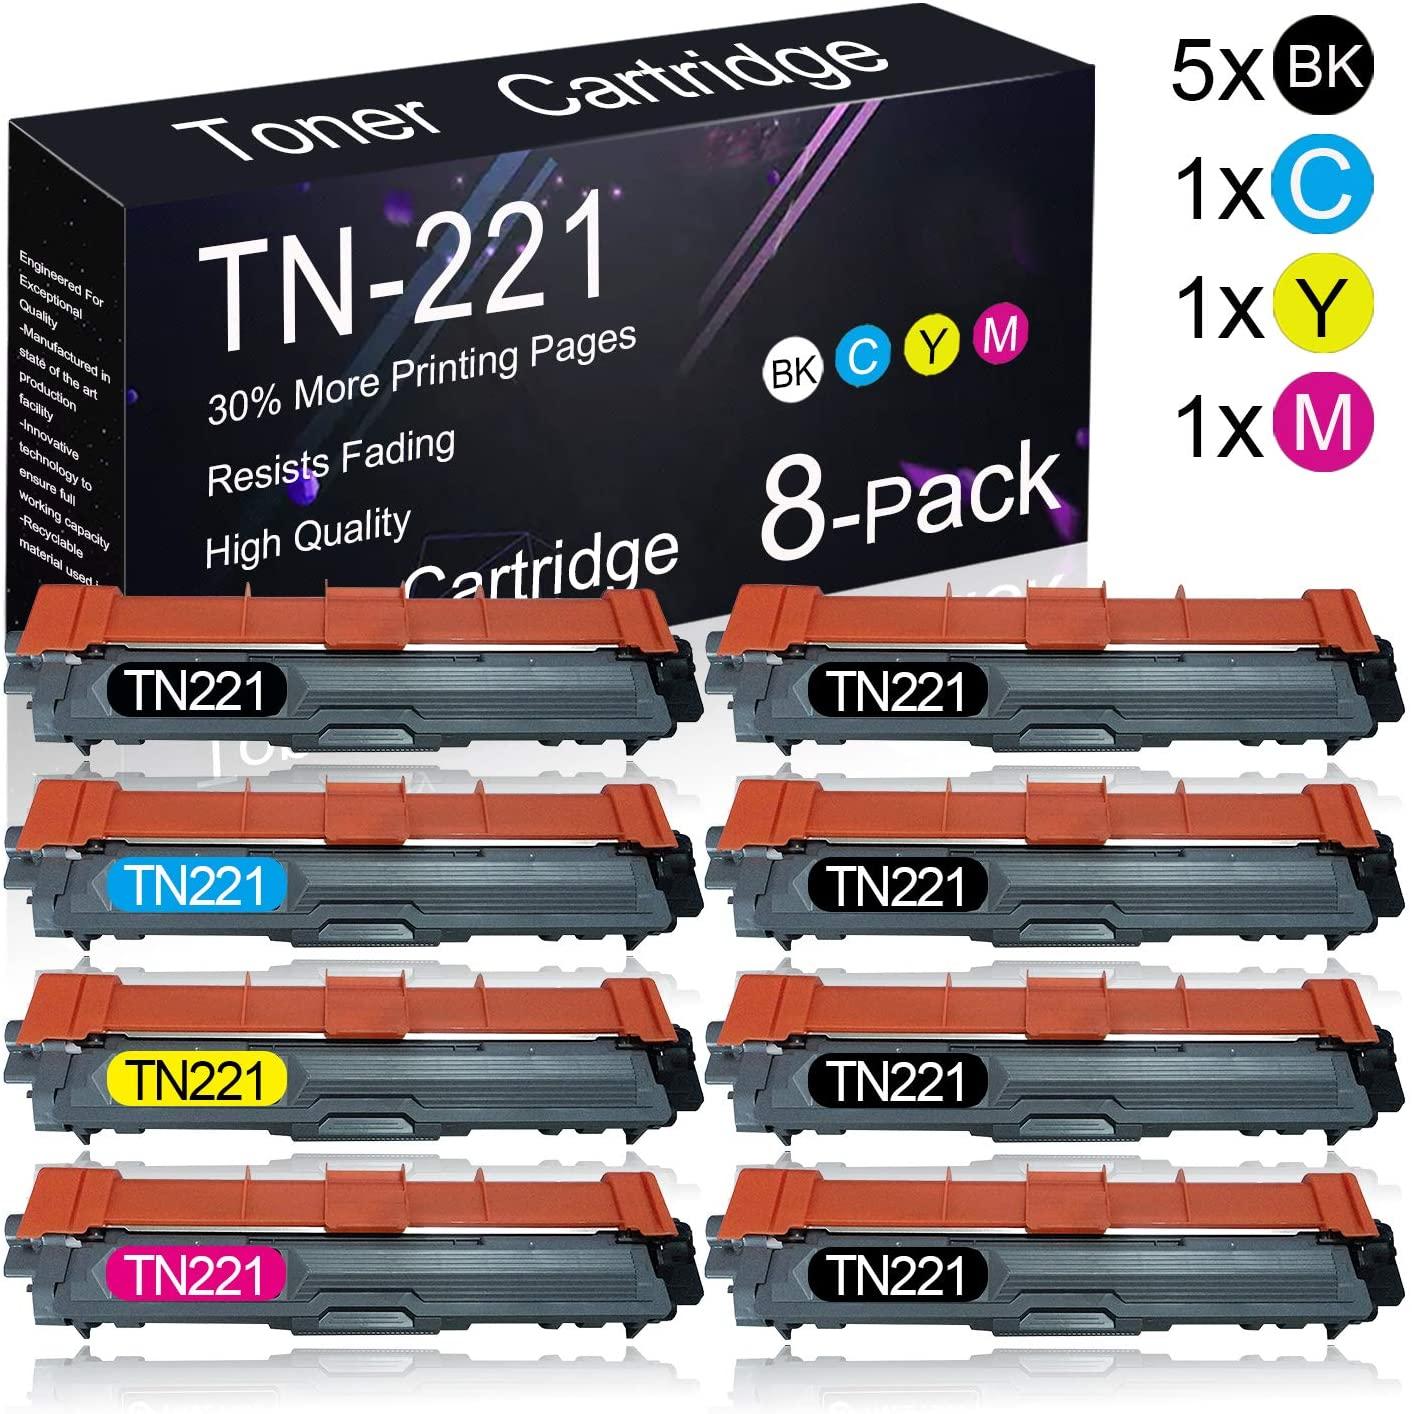 8 Pack TN221 (5BK+1C+1Y+1M) Compatible Toner Cartridge Replacement for Brother HL-3140CW/ 3150CDN/ 3170CDW/ 3180CDW, MFC-9130CW/ 9140CDN/ 9330CDW/ 9340CDW, DCP-9015CDW/ 9020CDN Printers.